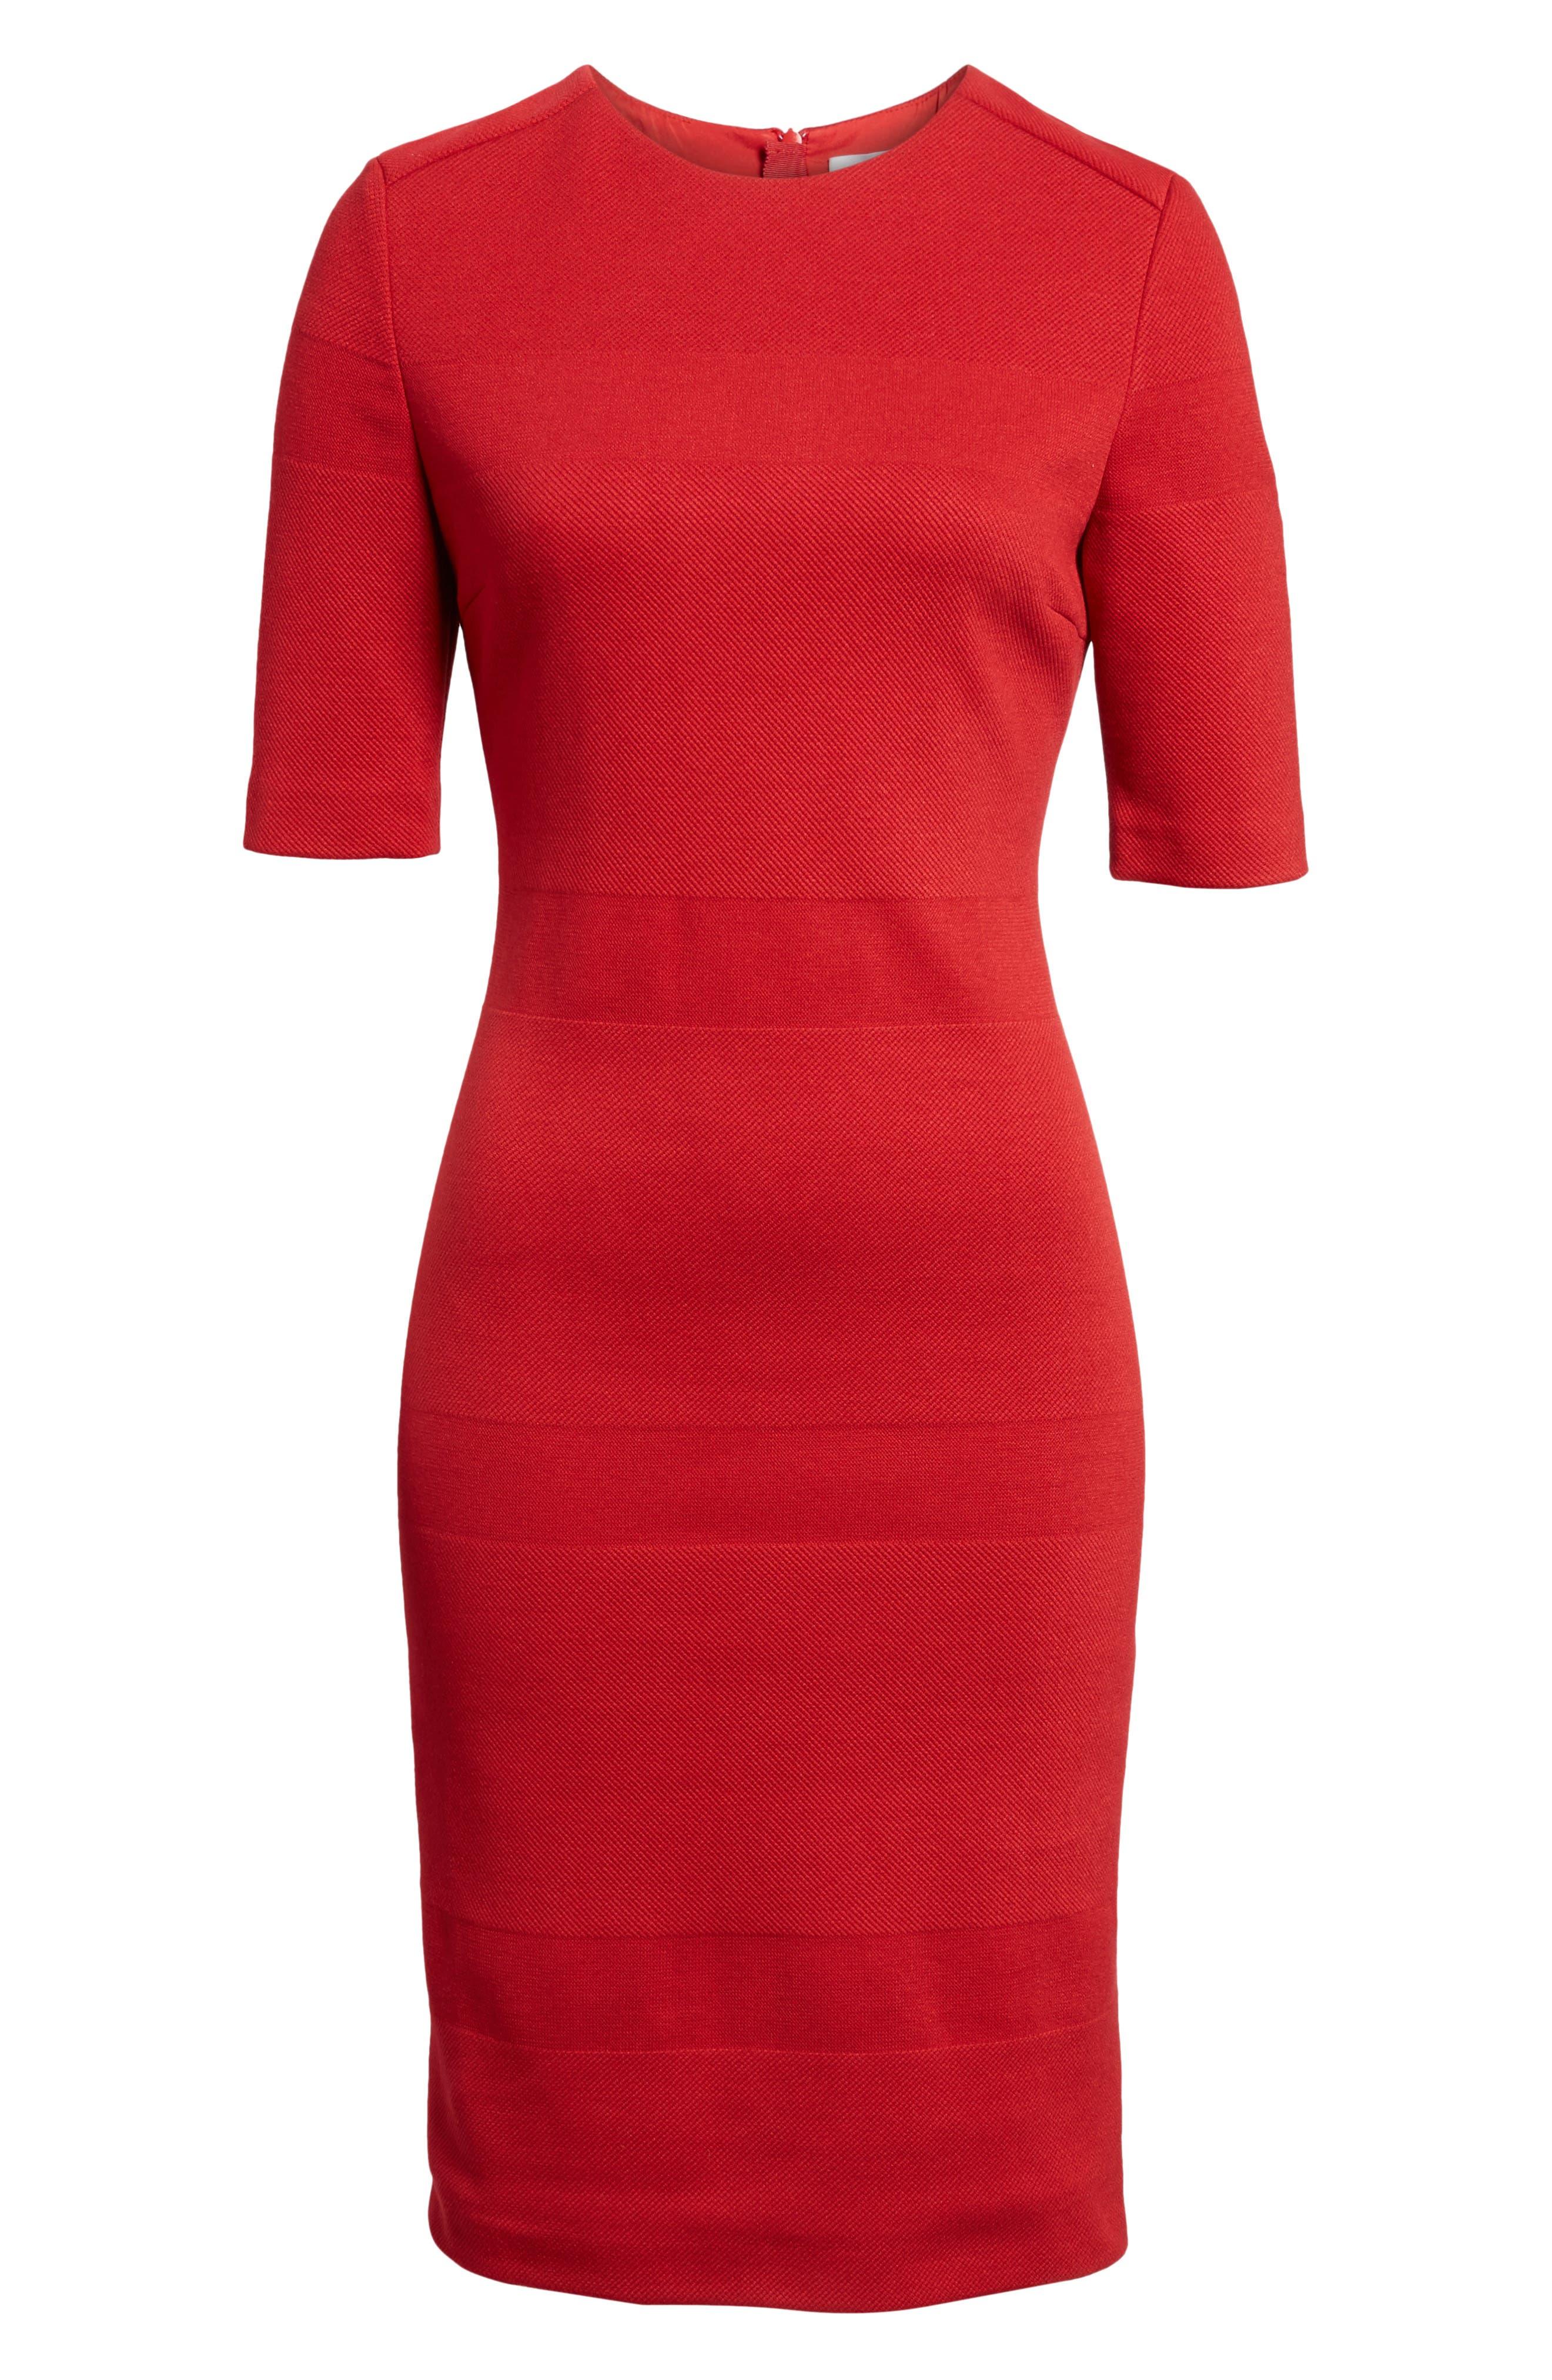 Hibela Tonal Stripe Dress,                             Alternate thumbnail 6, color,                             Crimson Red